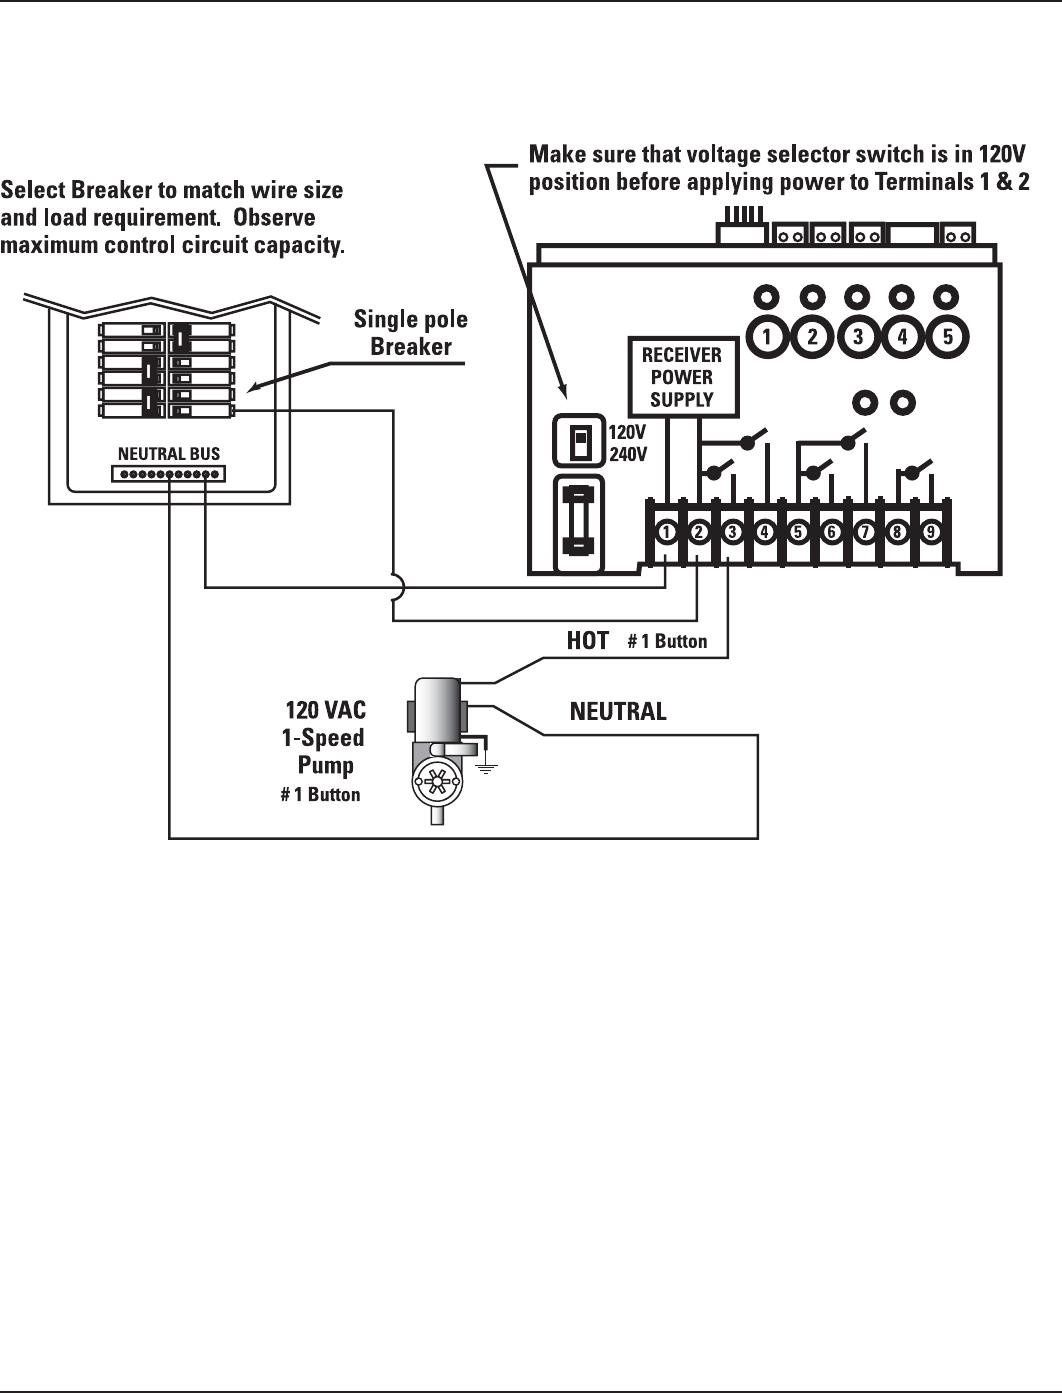 [SCHEMATICS_4PO]  Intermatic PE000953 Hand Held Transceiver User Manual Exhibit D Users Manual  per 2 1033 b3 | Hot Tub Electrical Wiring Diagram 120vac |  | UserManual.wiki